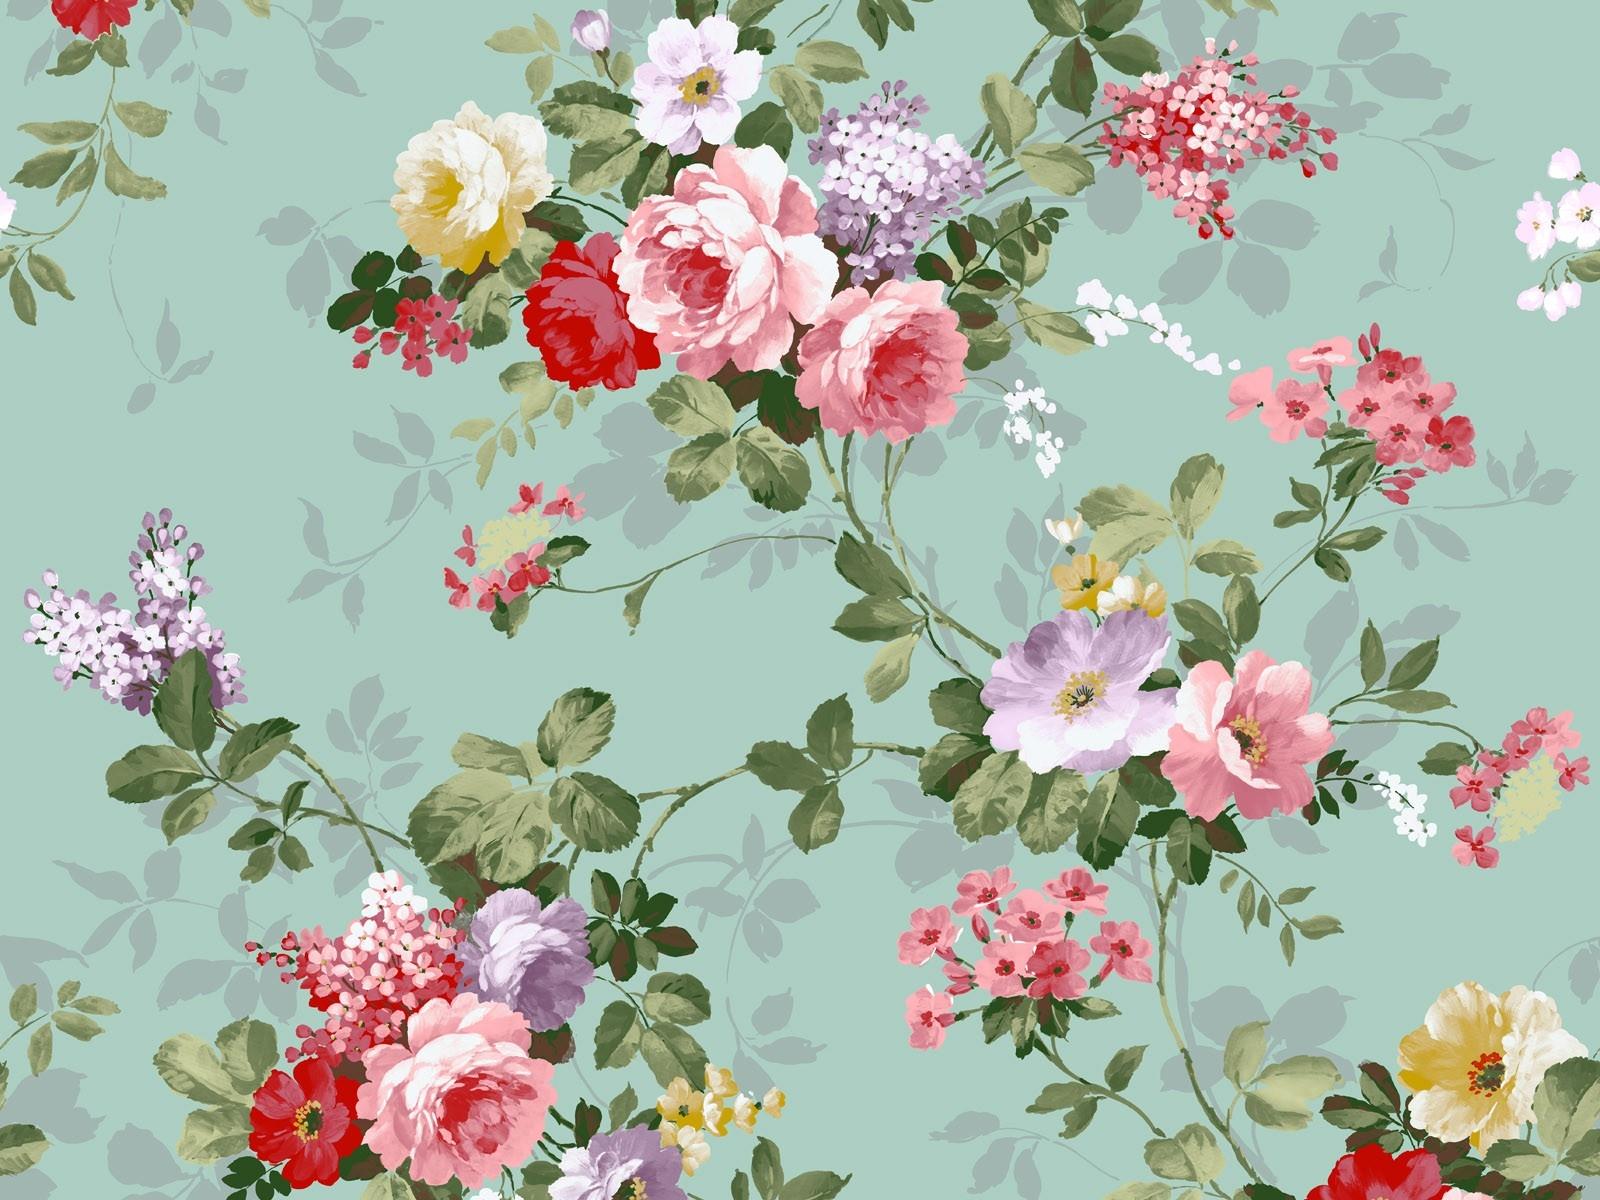 amazing vintage floral iphone wallpaper tumblr | KARIŞIK